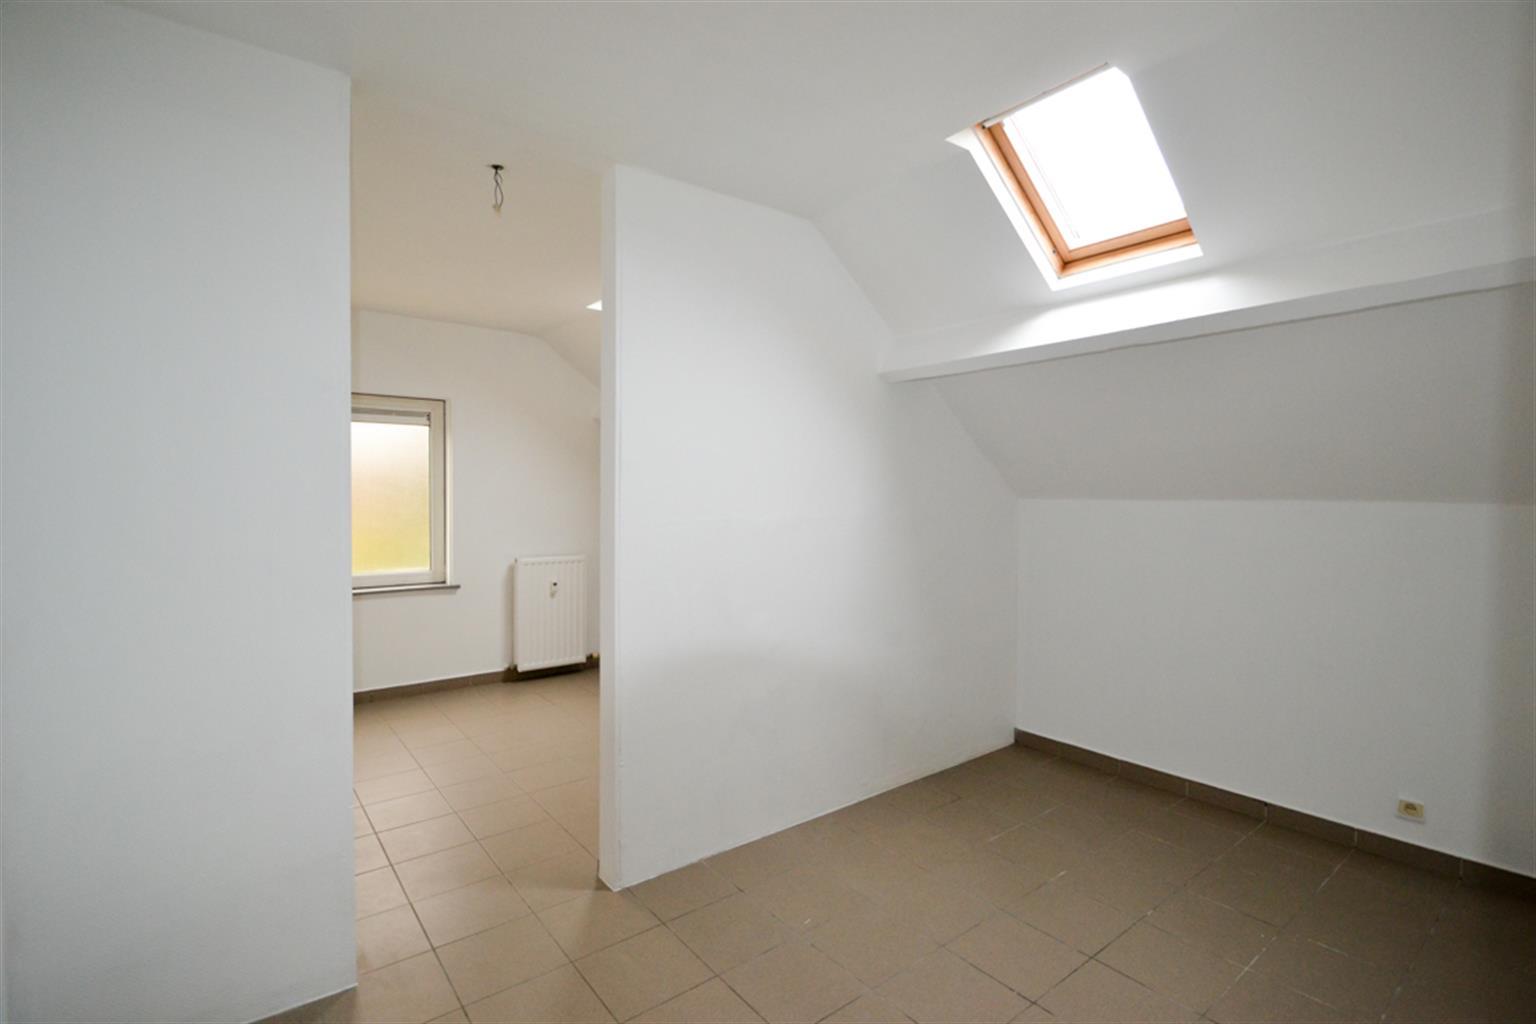 Appartement - Leval-Trahegnies - #3703787-3